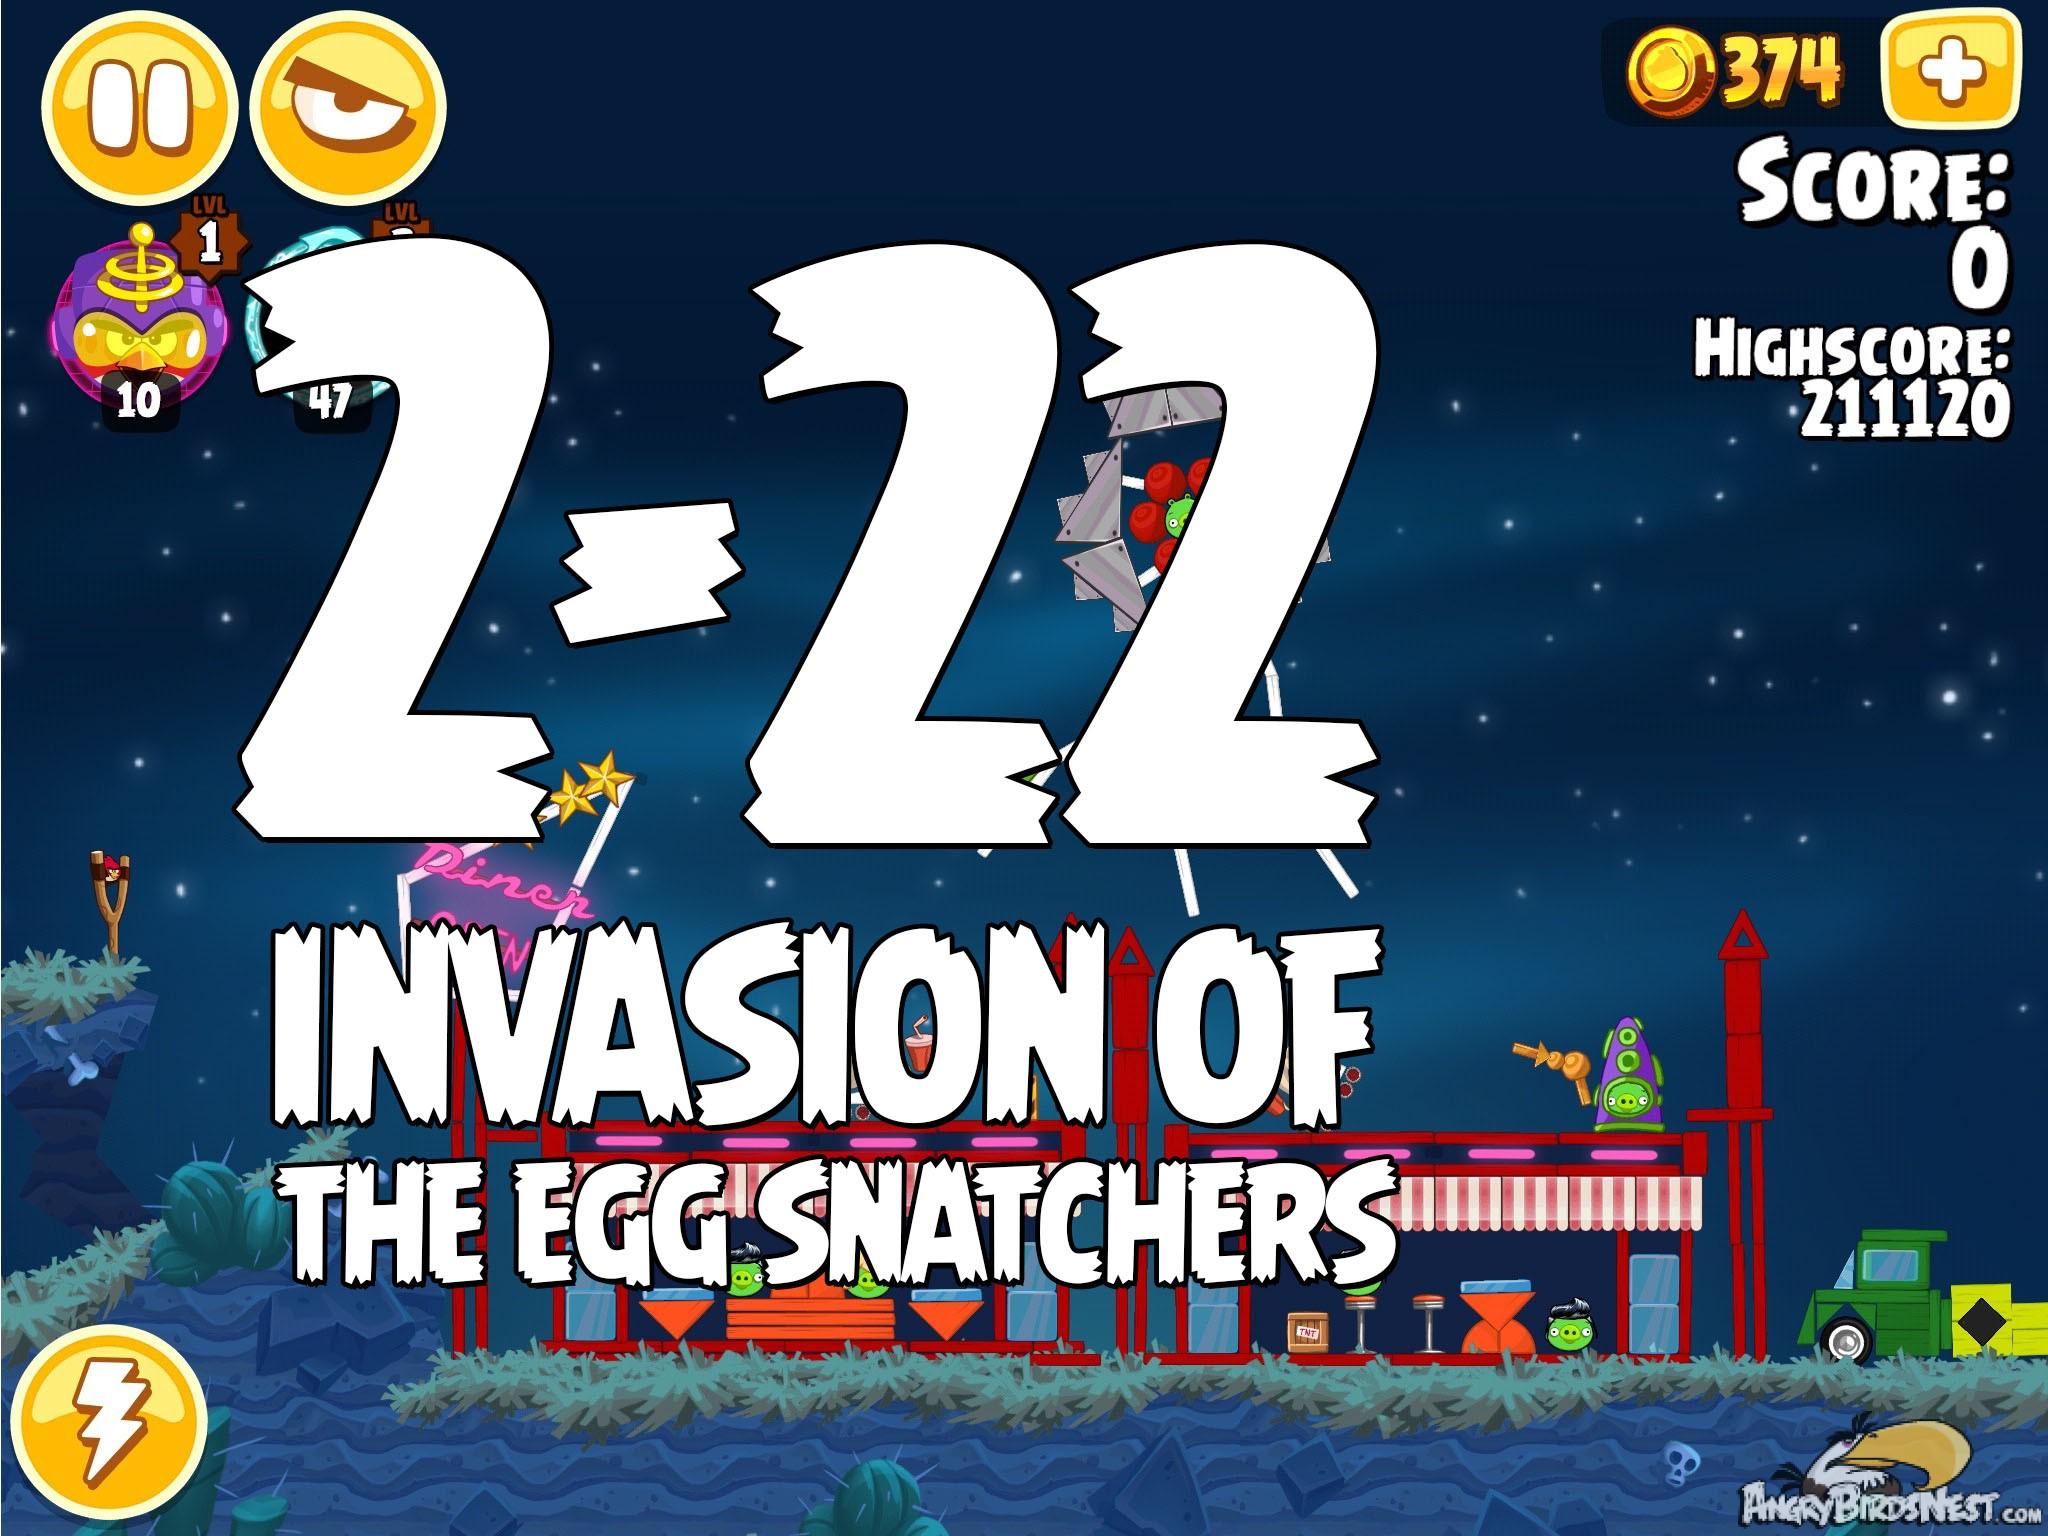 Invasion of the egg snatchers level 2 22 walkthrough angrybirdsnest